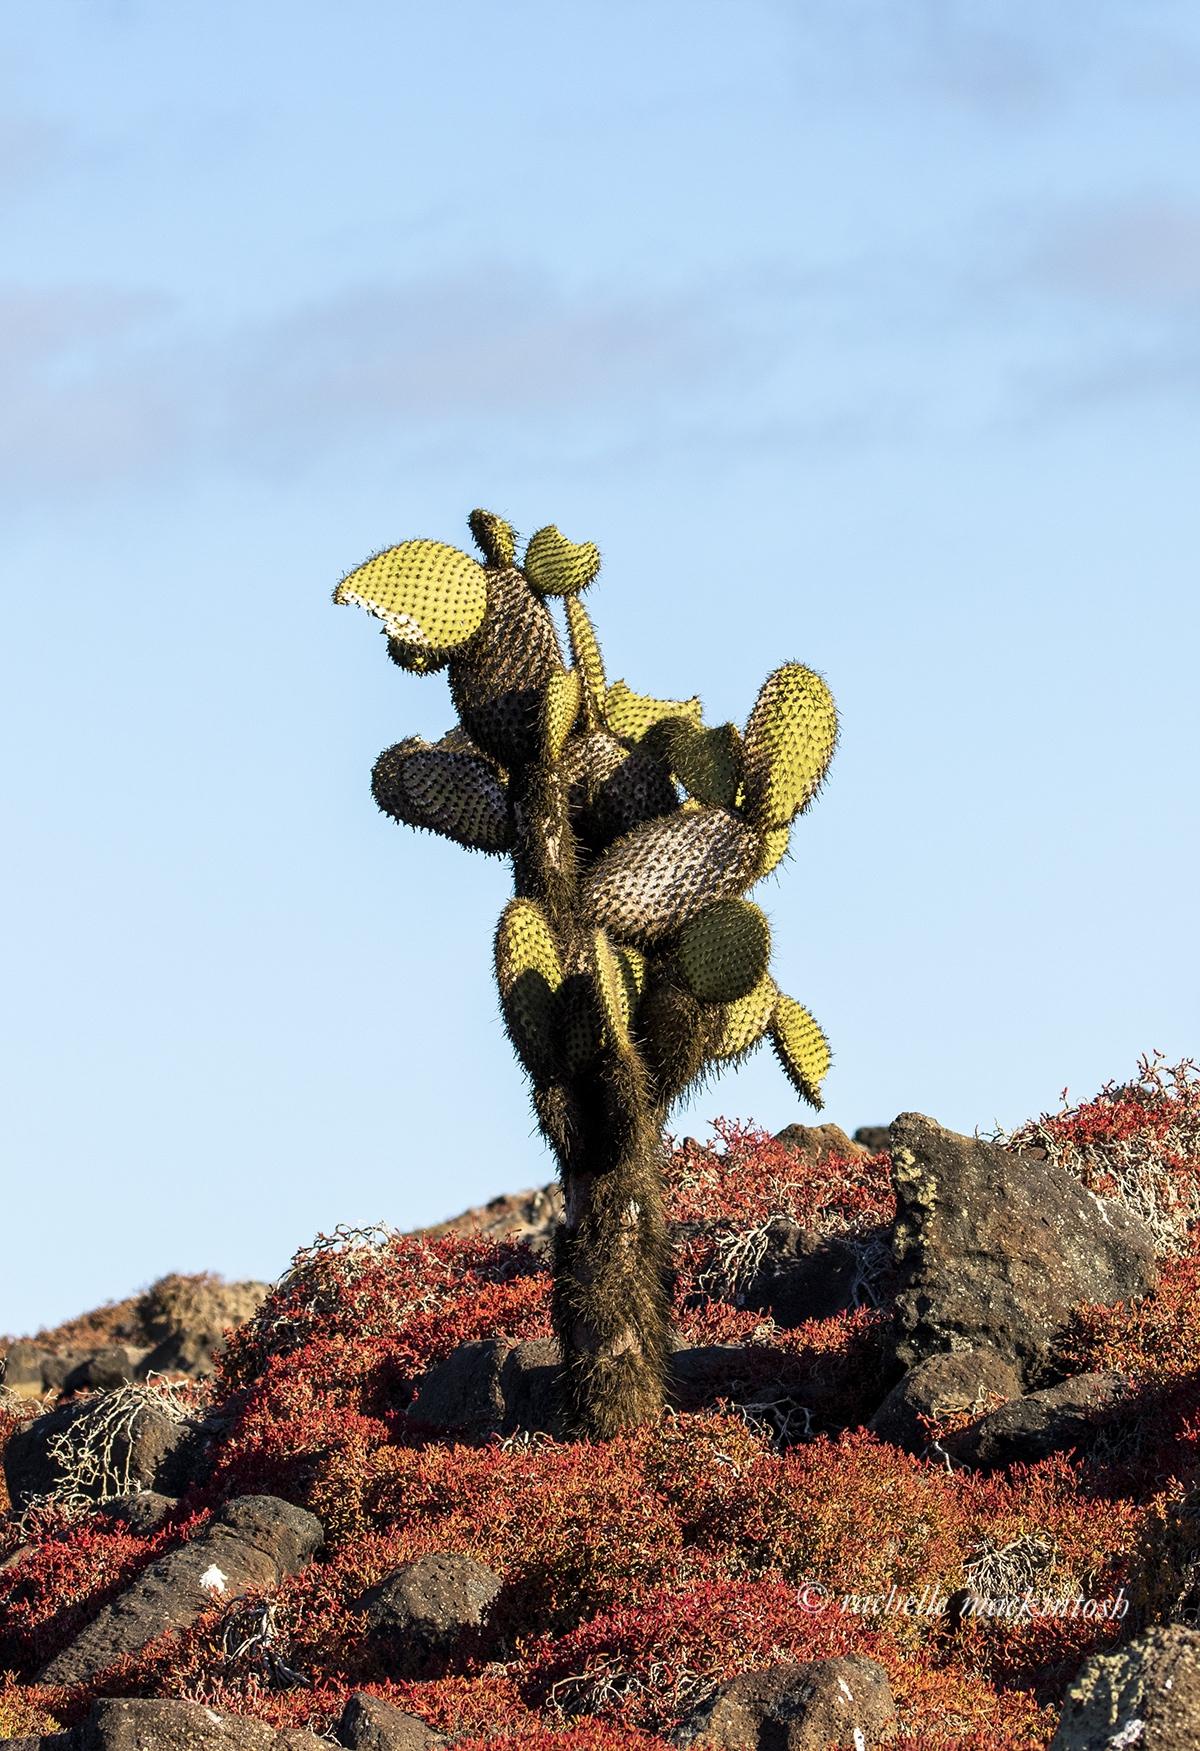 cactus galapagos islands ecuador